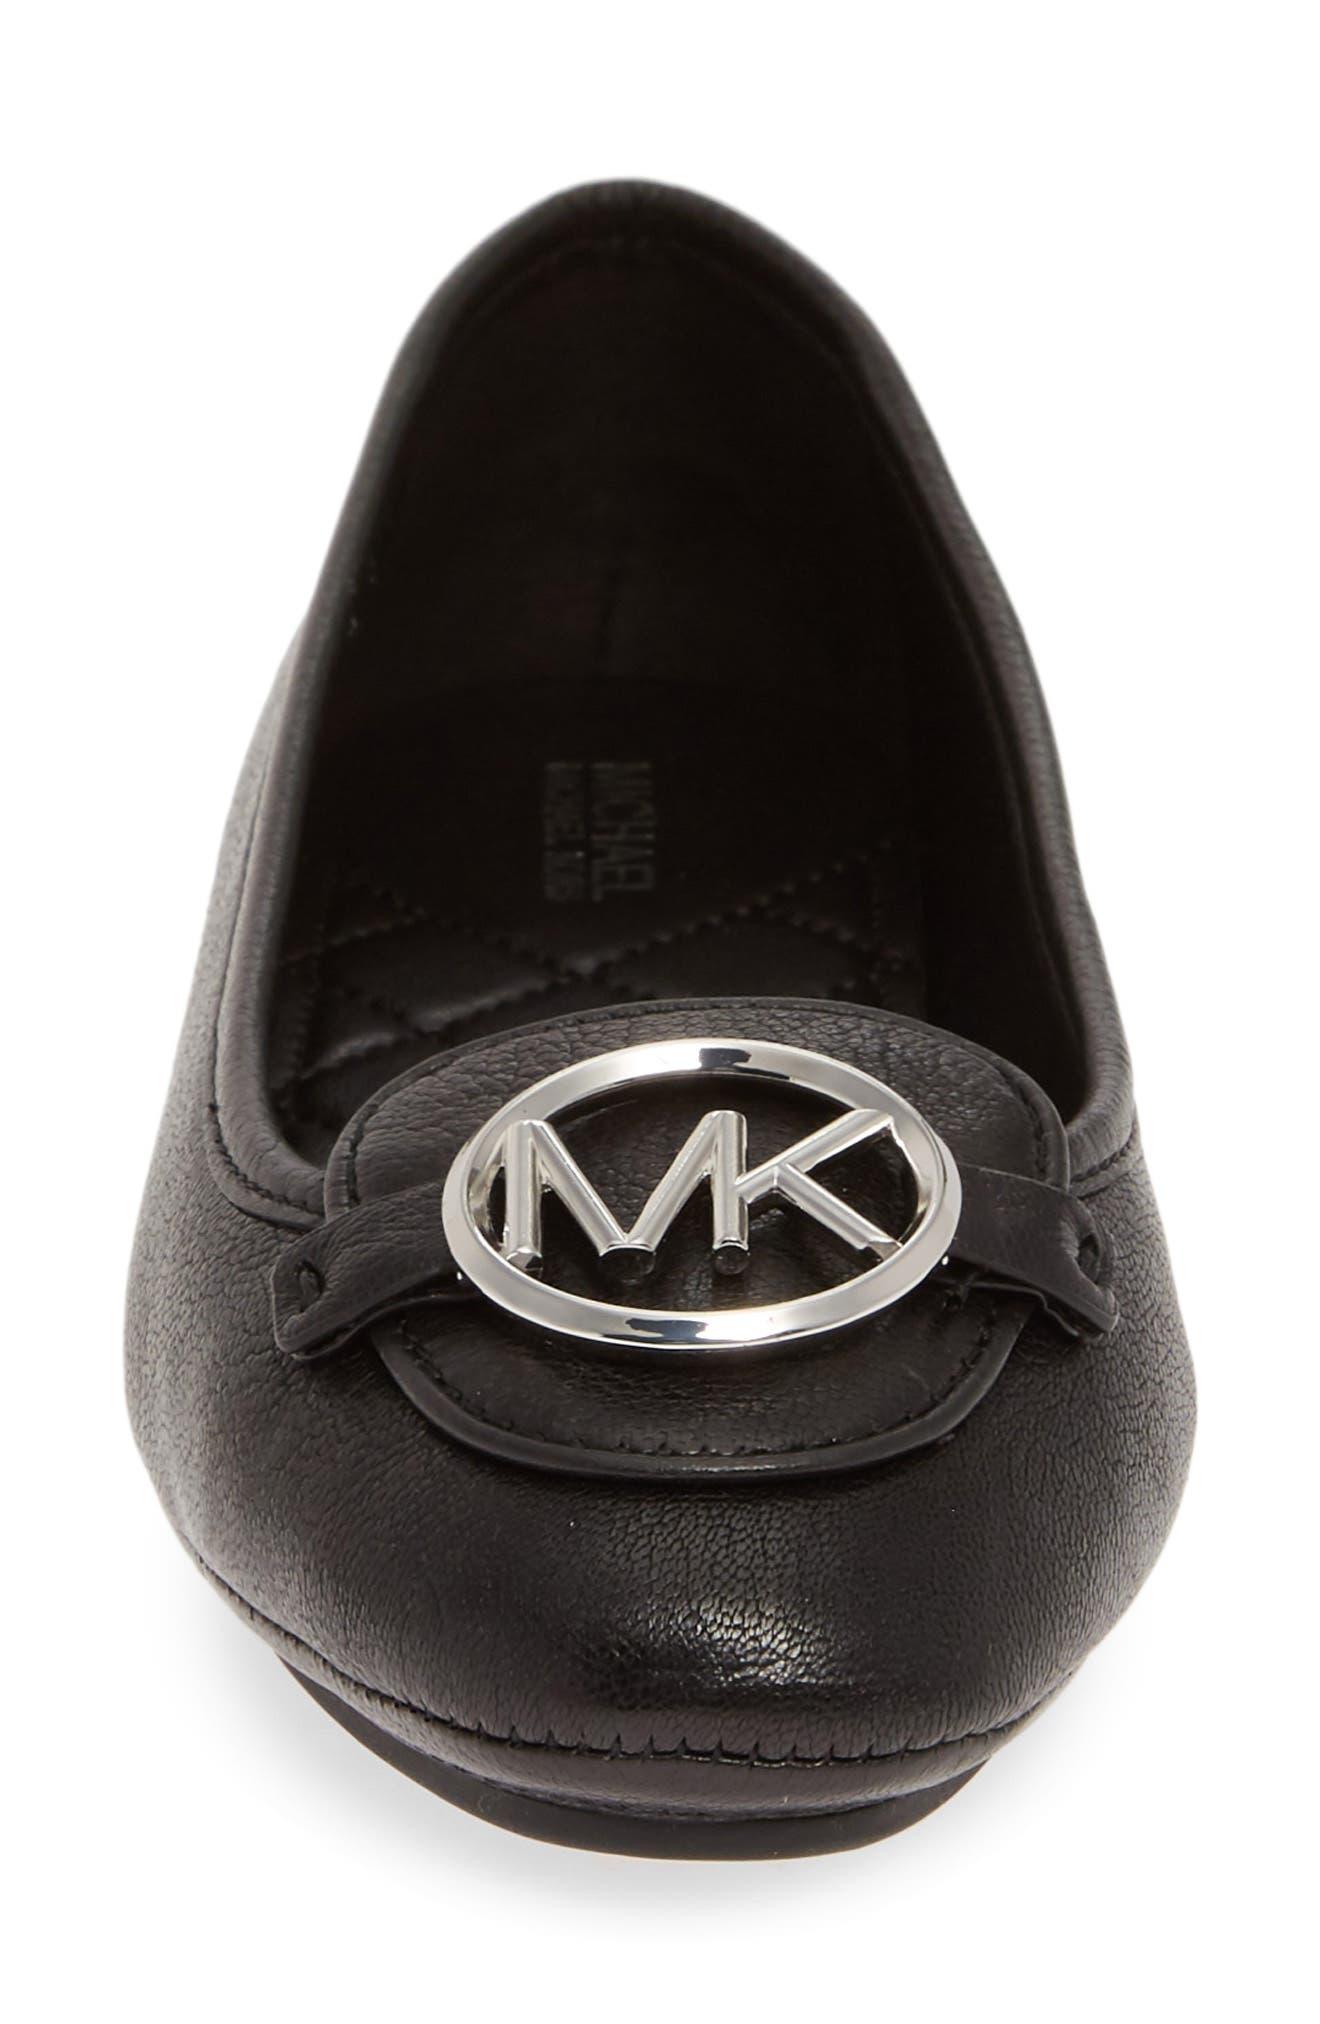 MICHAEL MICHAEL KORS, Lillie Logo Ballet Flat, Alternate thumbnail 4, color, BLACK LEATHER/ SILVER LOGO